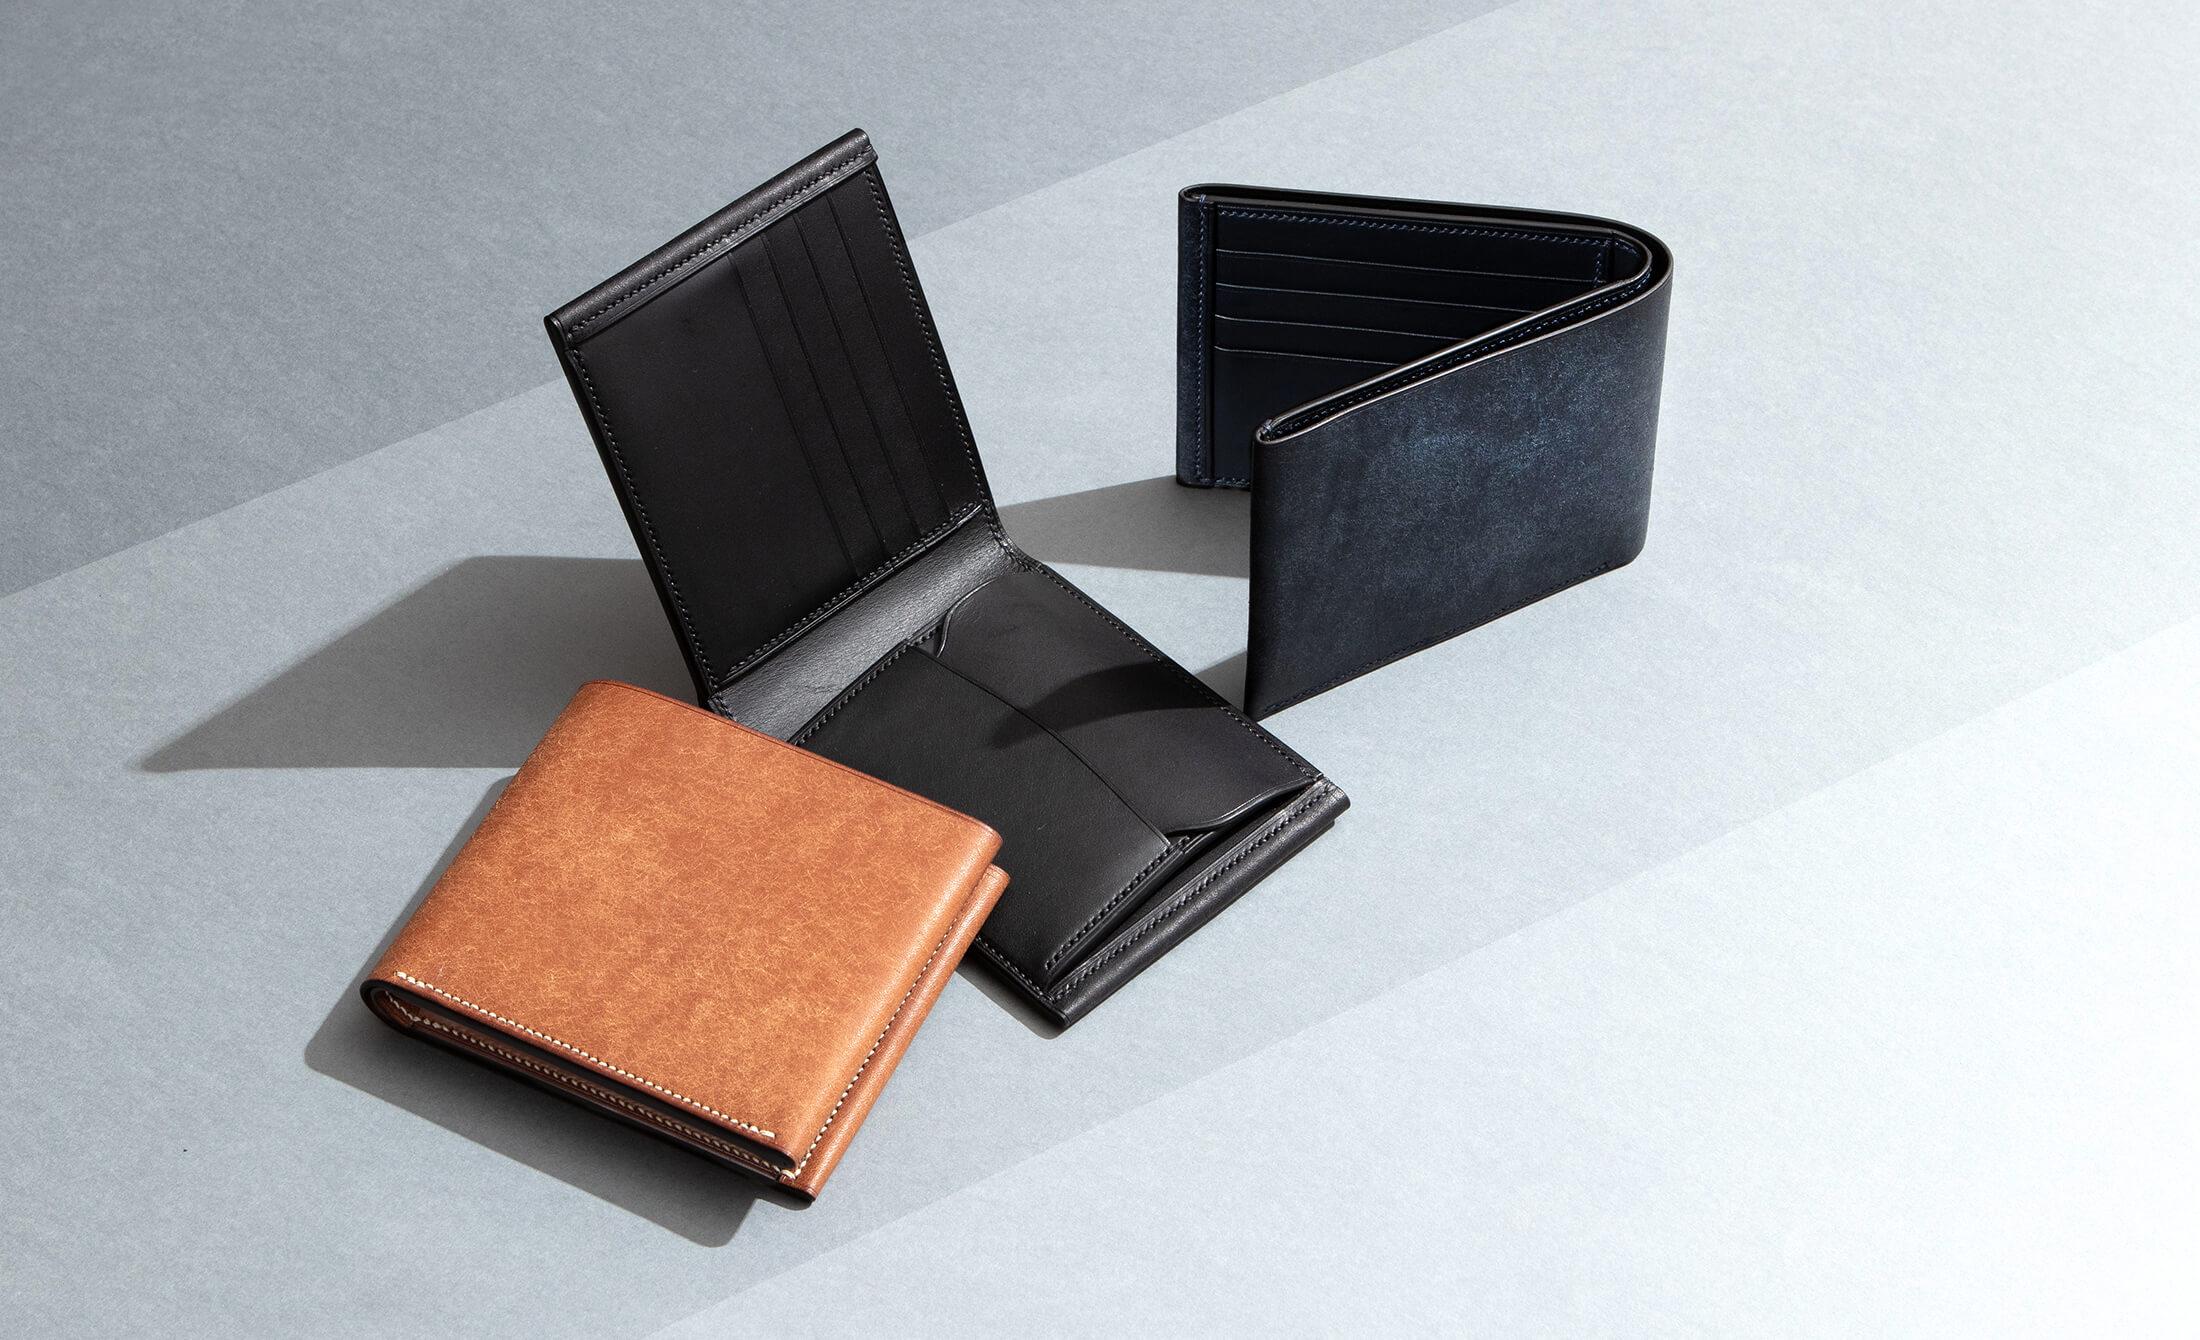 『Lutece』の二つ折り財布giglio(ジリオ)